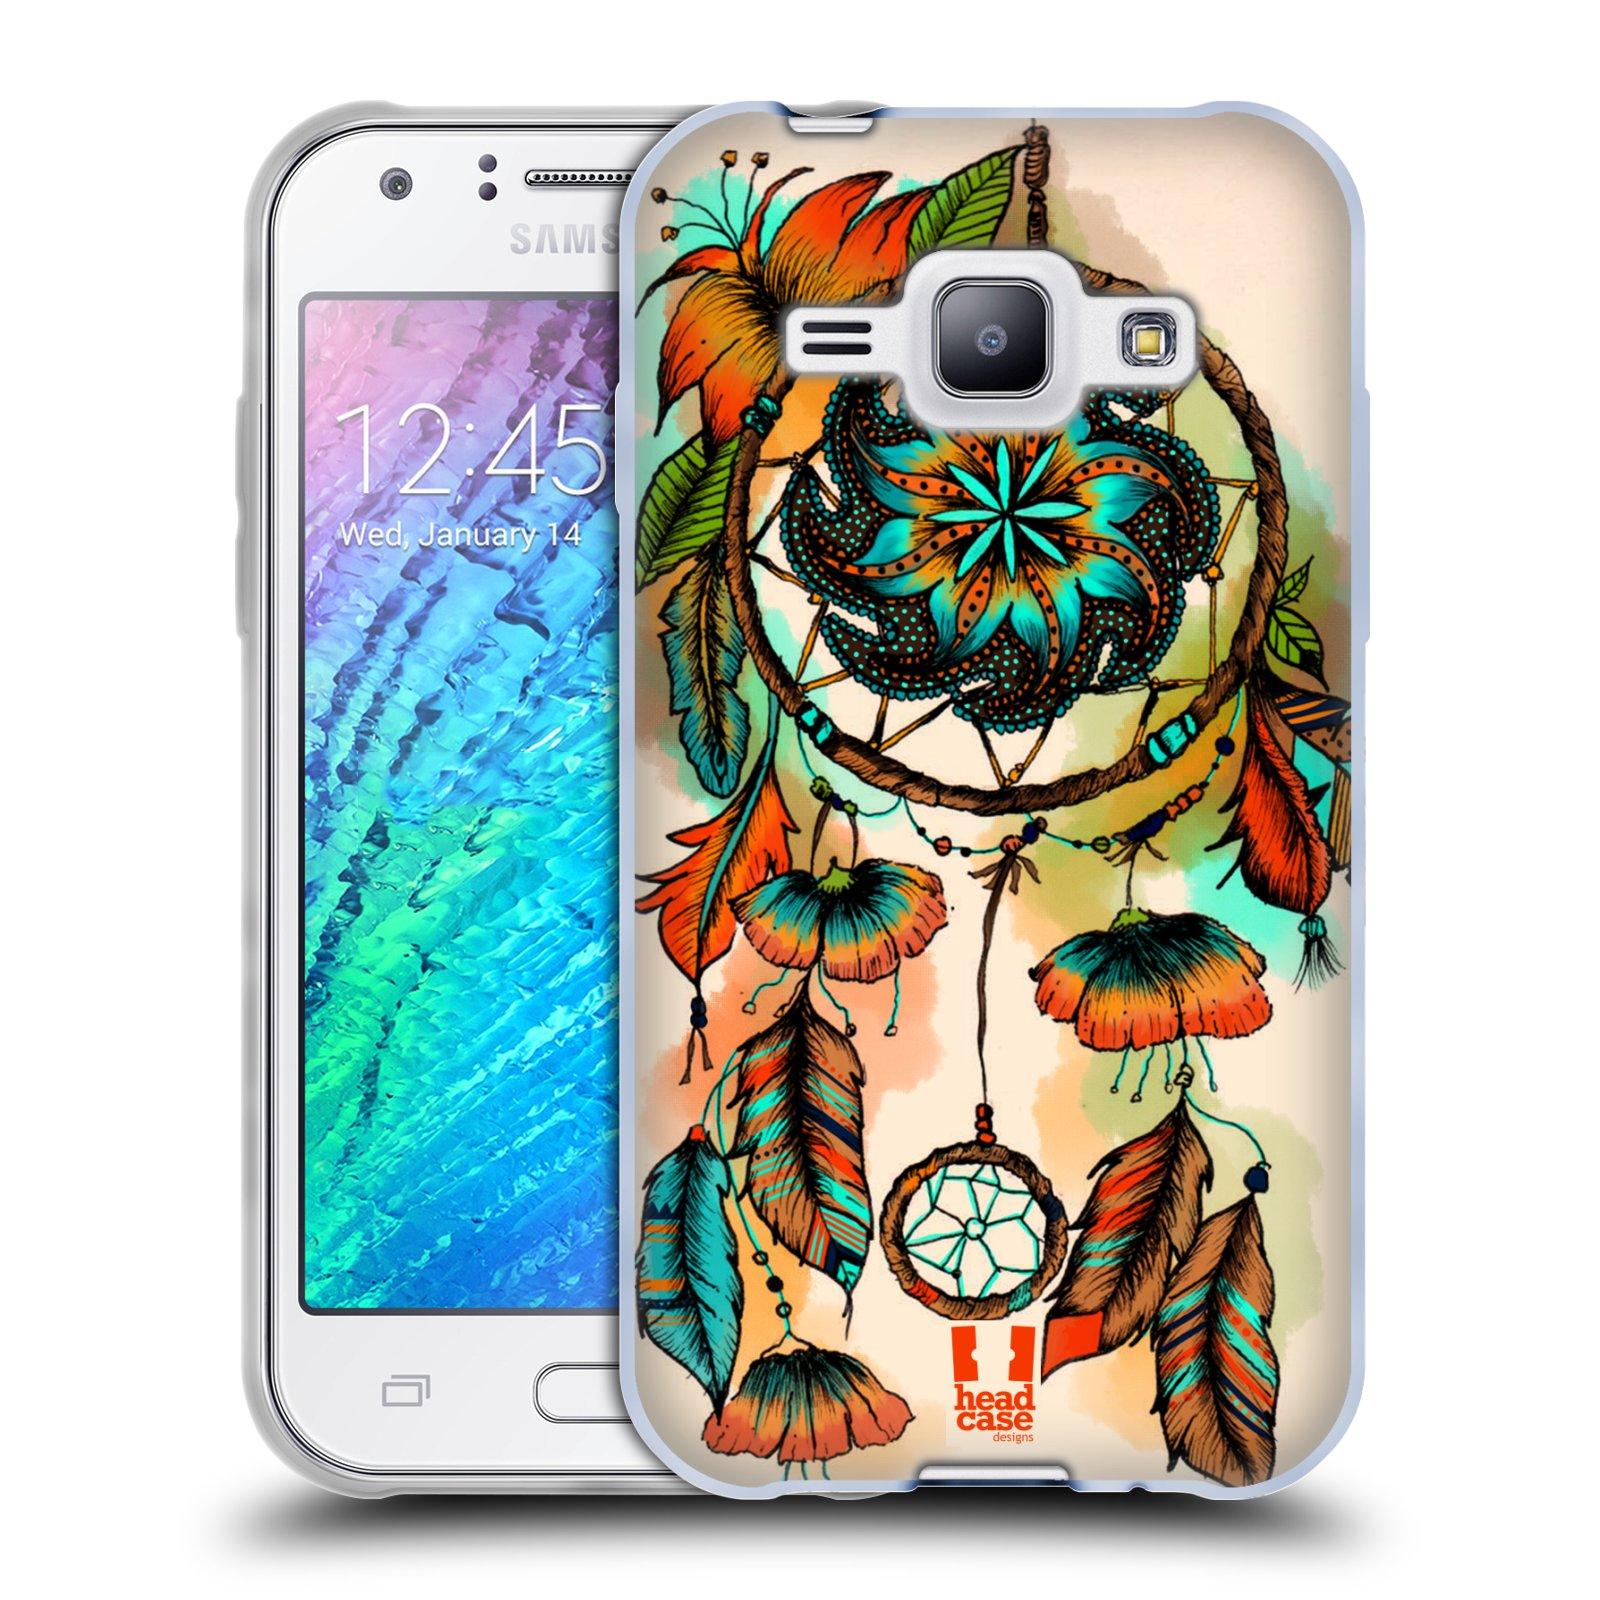 HEAD CASE silikonový obal na mobil Samsung Galaxy J1 vzor Květy lapač snů